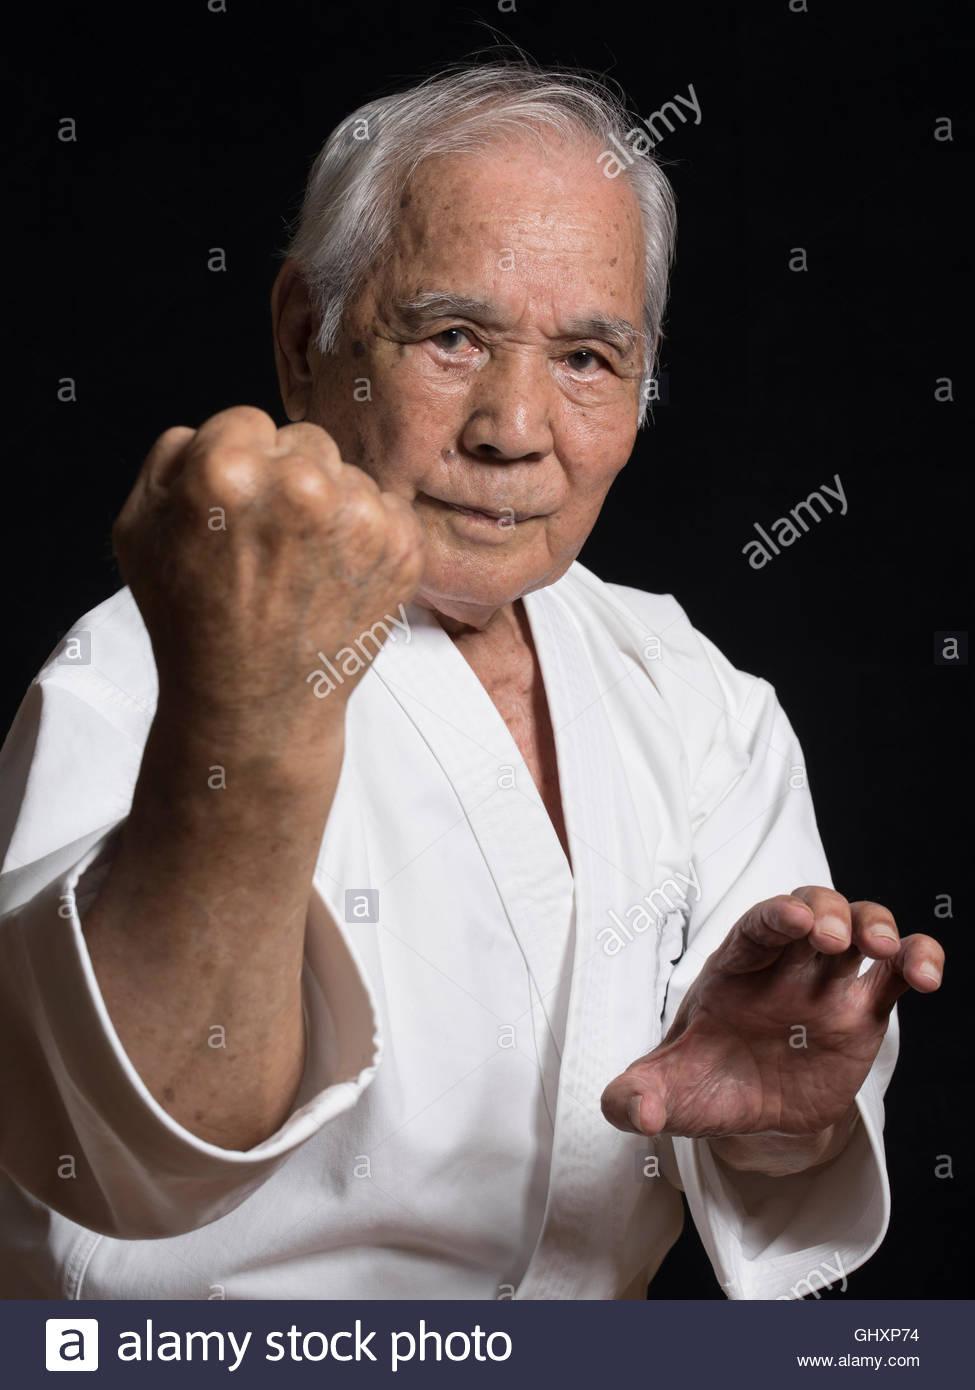 86-year old Karate Master Shintoku Takara 10th dan Okinawa Uechi-ryu Karatedo Kyokai (D.0.B. 10/05/1930). Okinawan - Stock Image